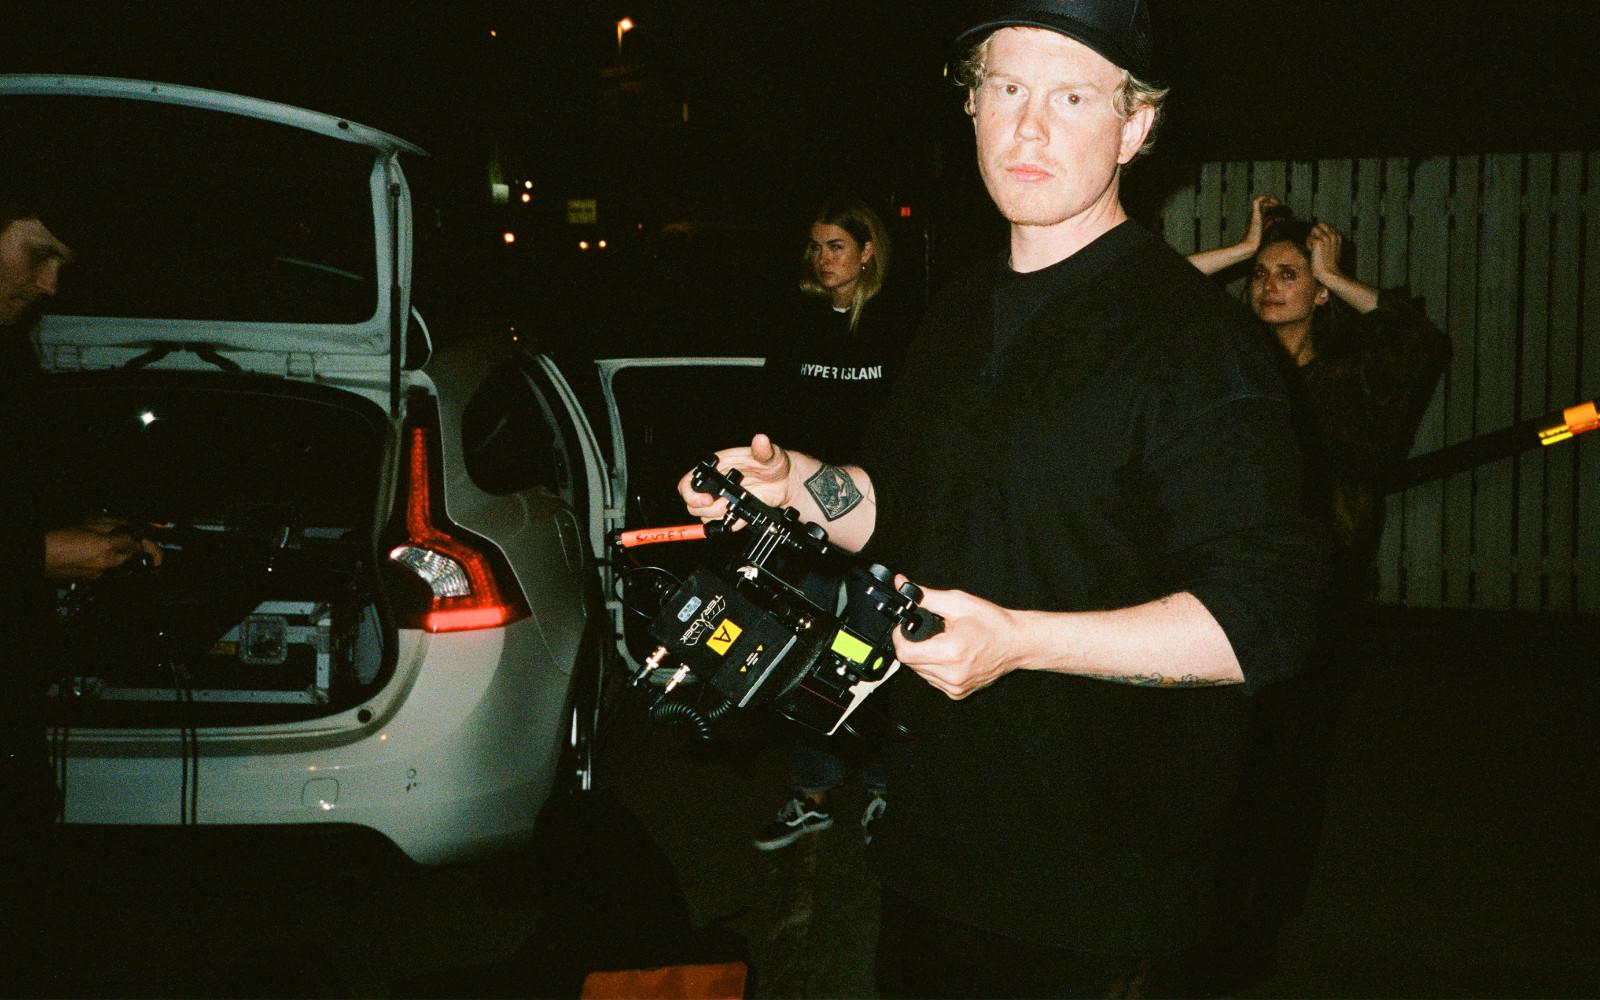 Filmregissören Mats Udd. Foto: Alexandros Bakos.